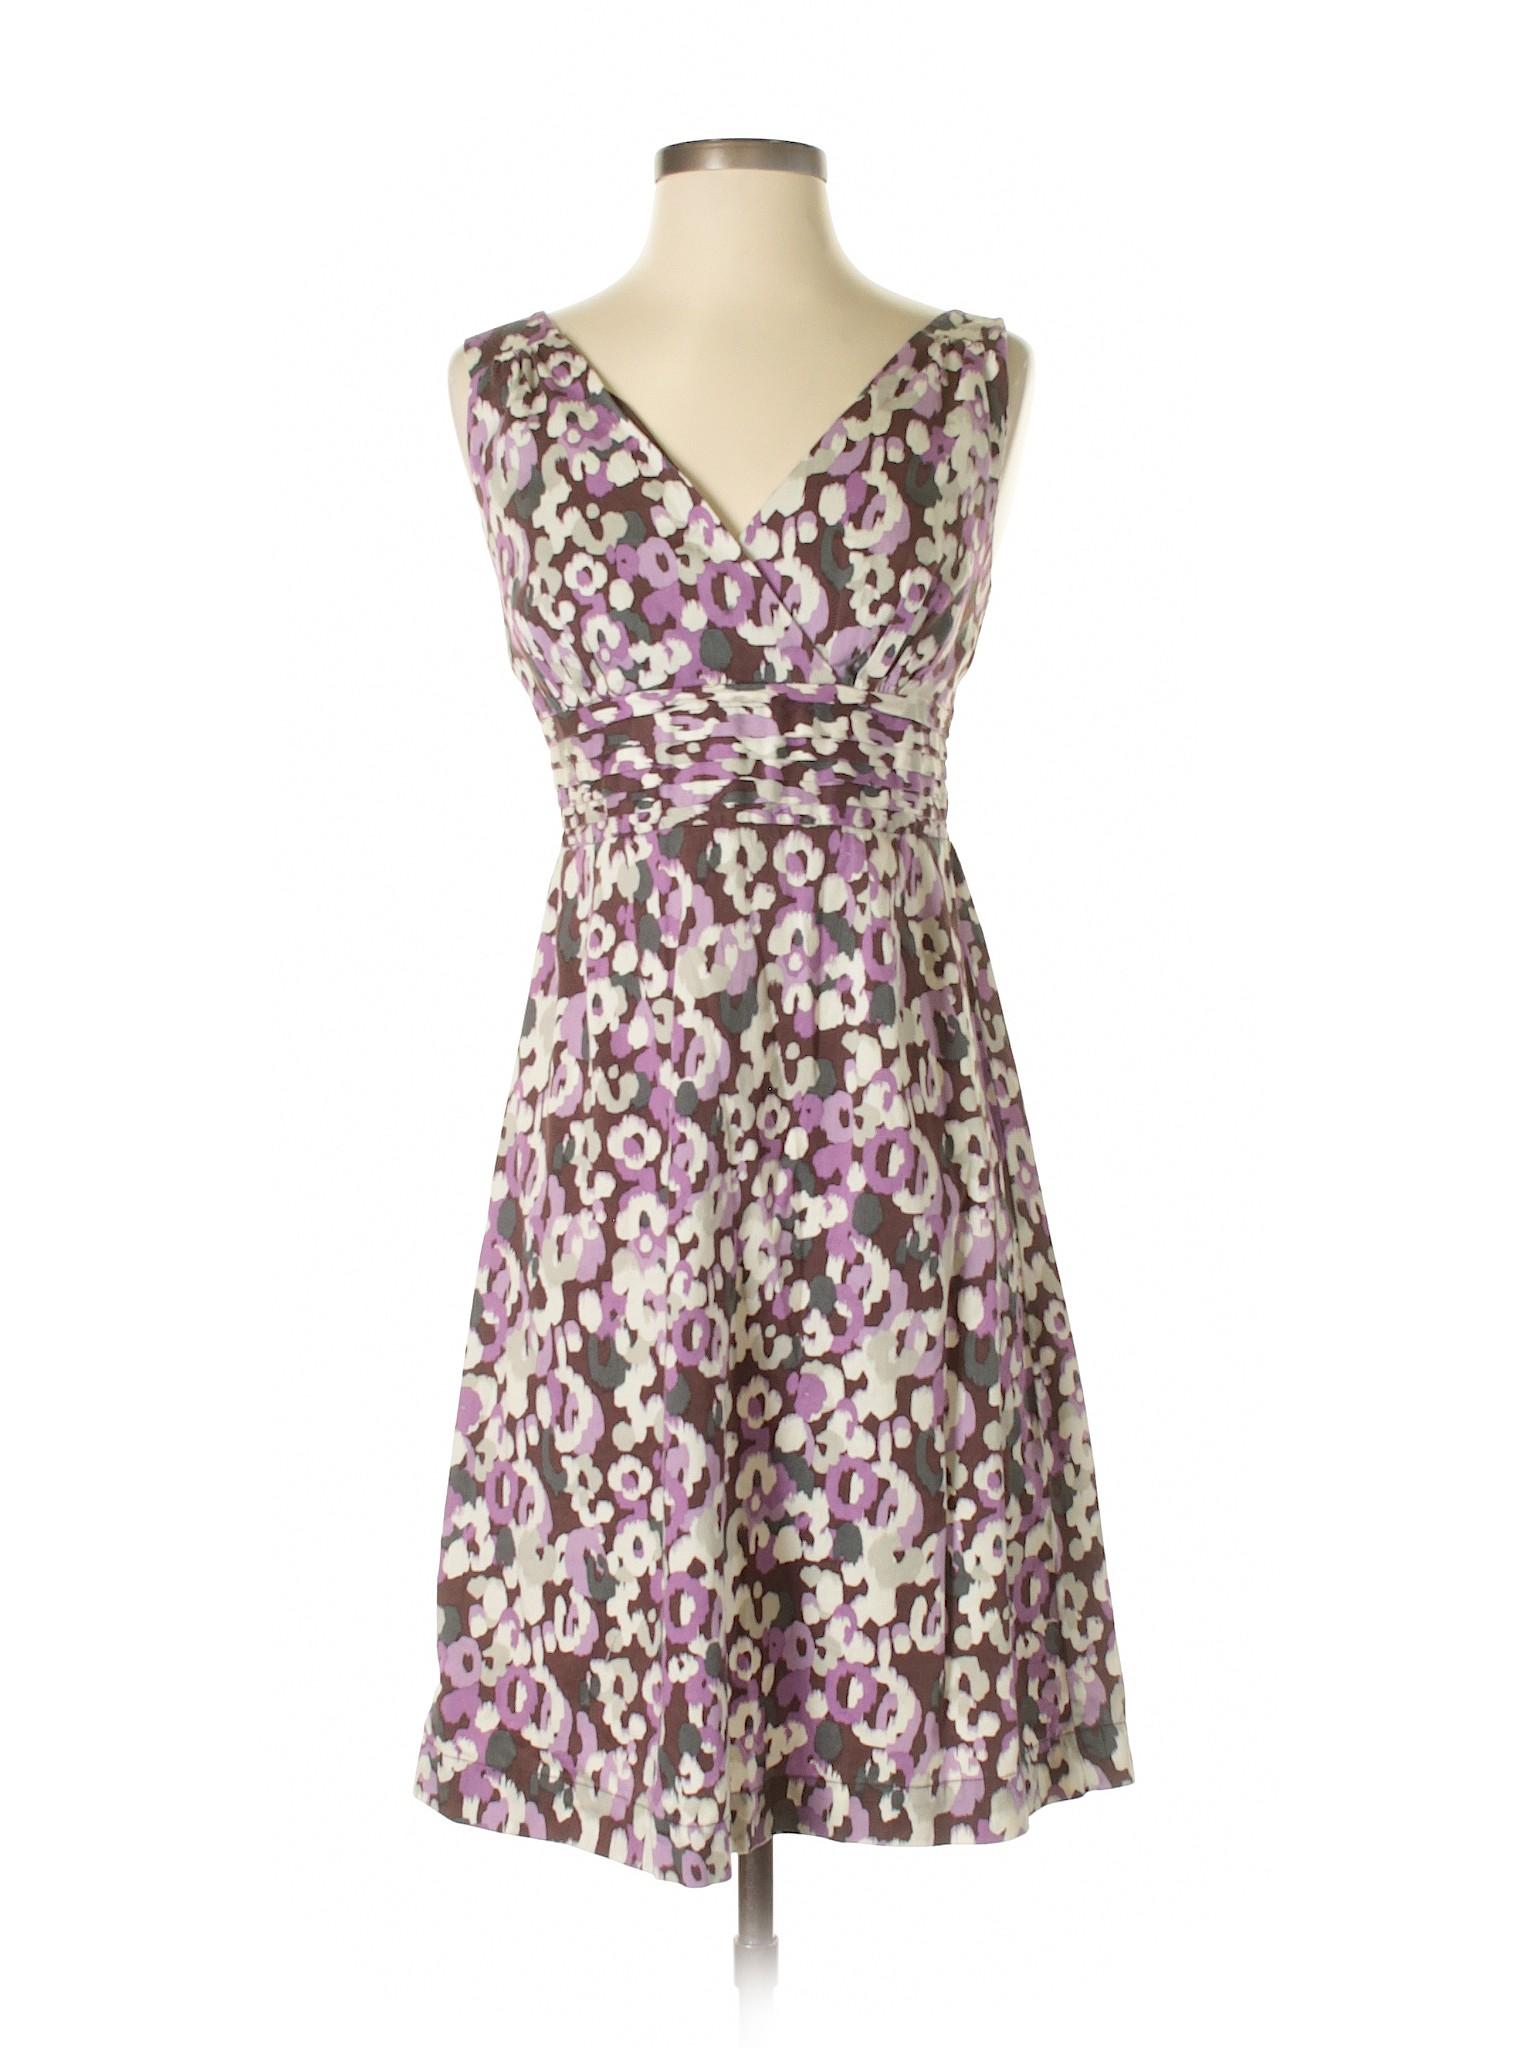 Dress Casual Merona Selling Selling Merona nW1TqBnx